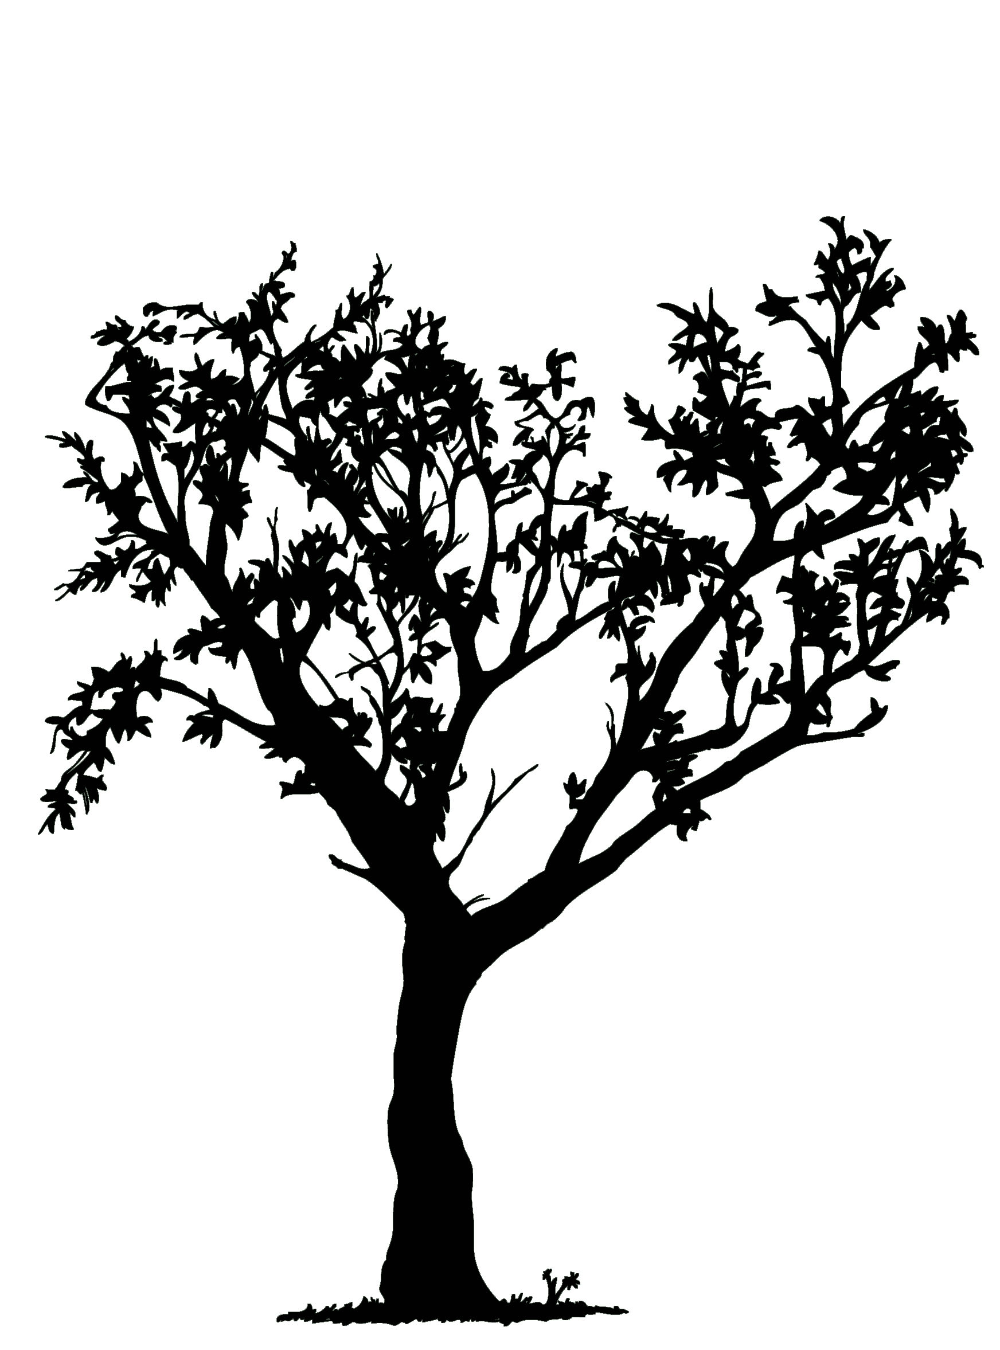 Trafaret Dereva Tree Clipart Tree Drawing Clipart Black And White